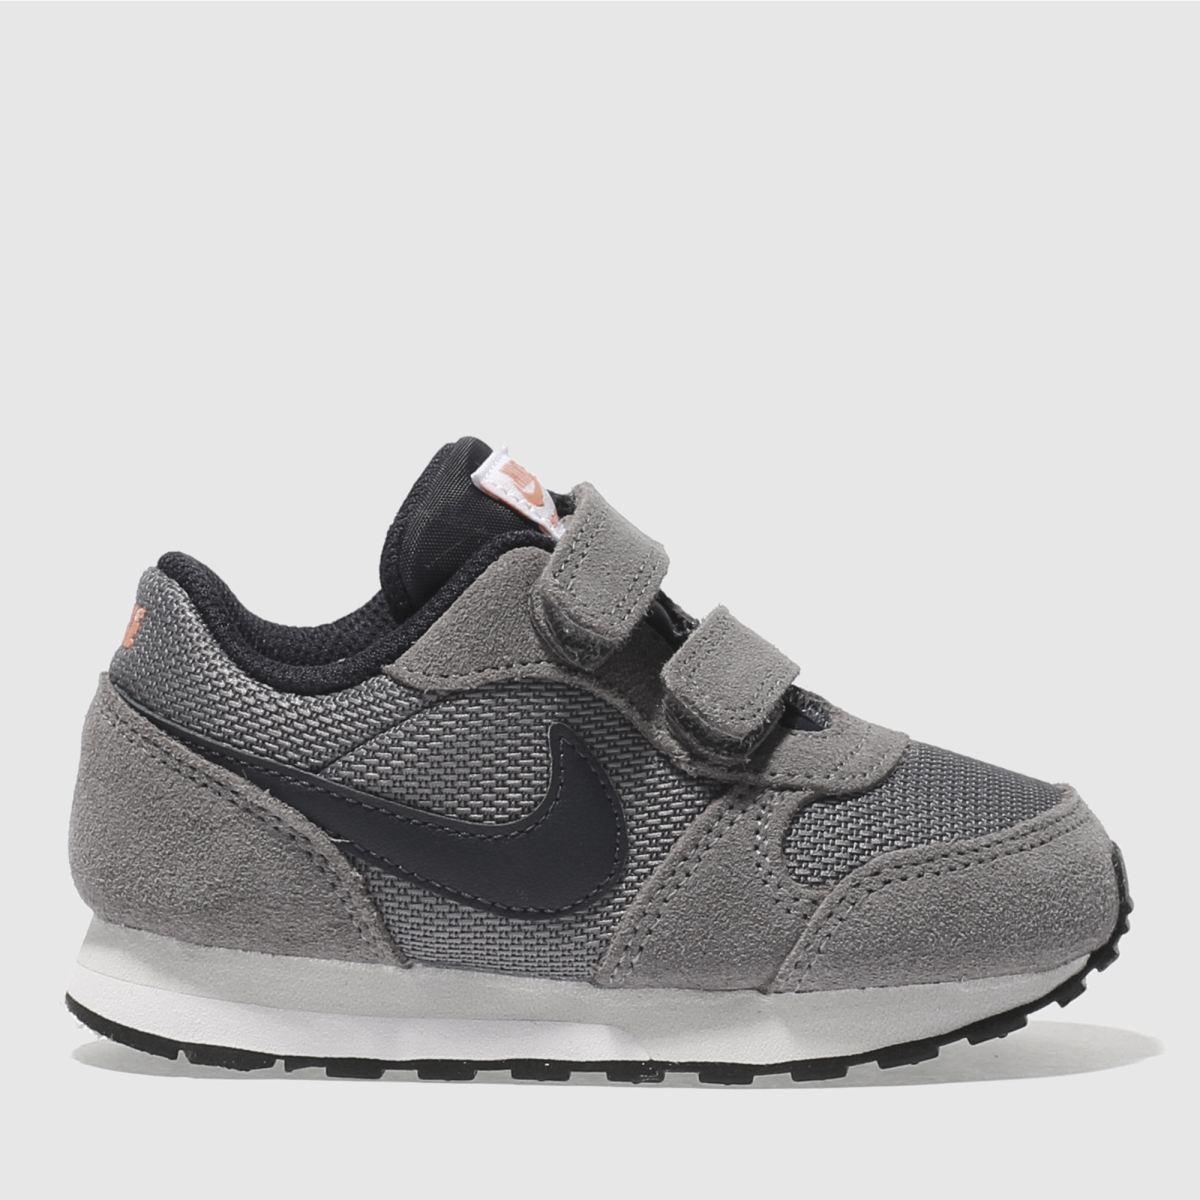 Nike Grey & Black Md Runner Boys Toddler Trainers